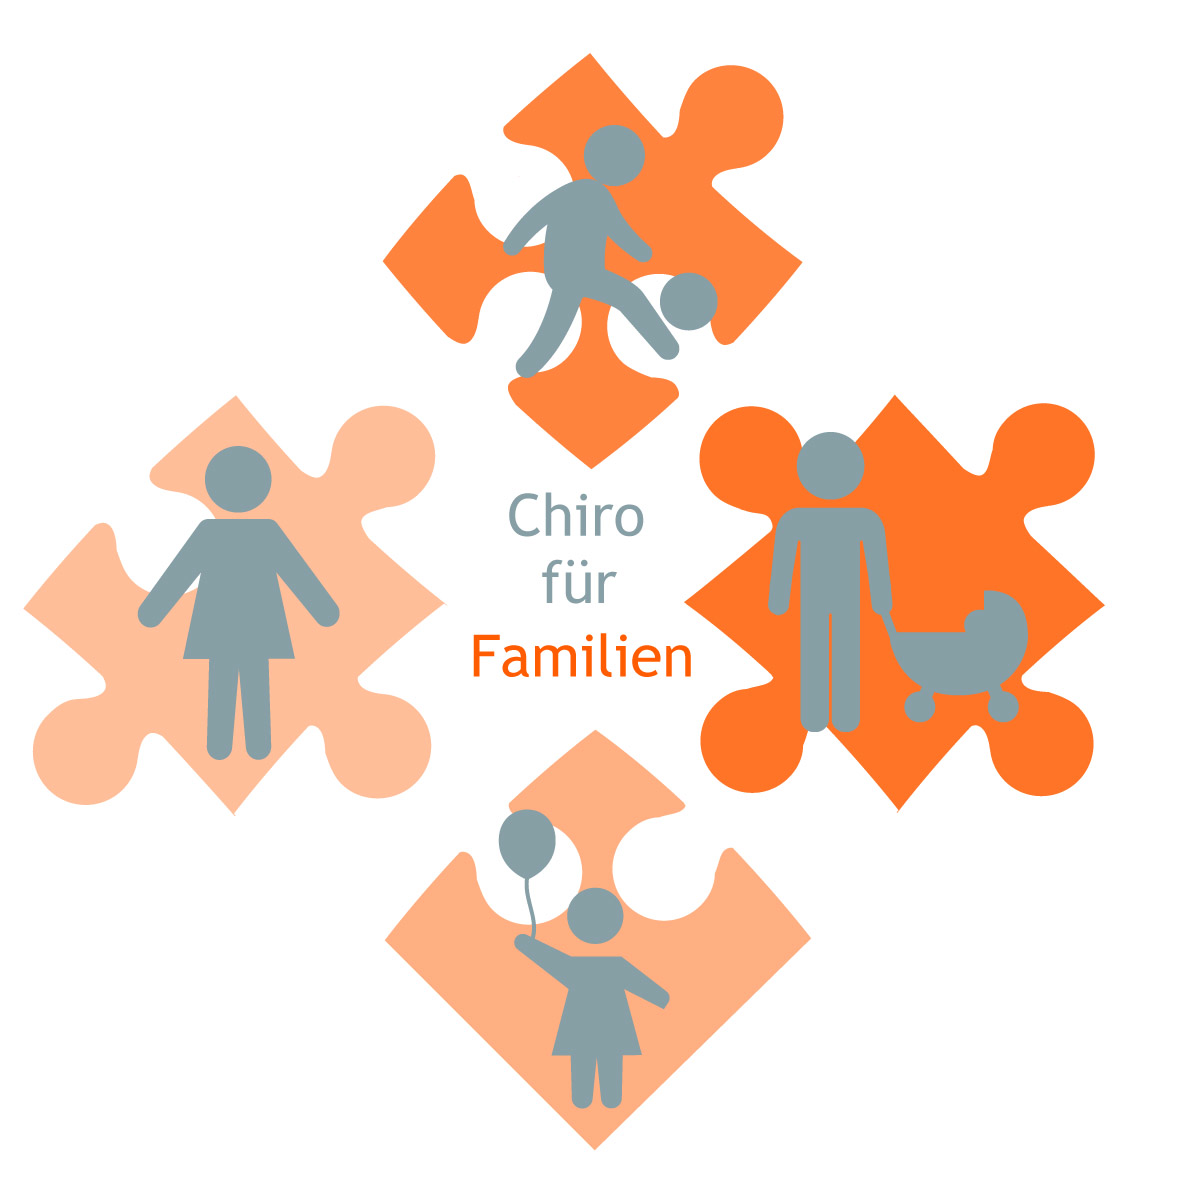 Carsten_Brinkpeter_Chiropraktik_Behandlung_Familien